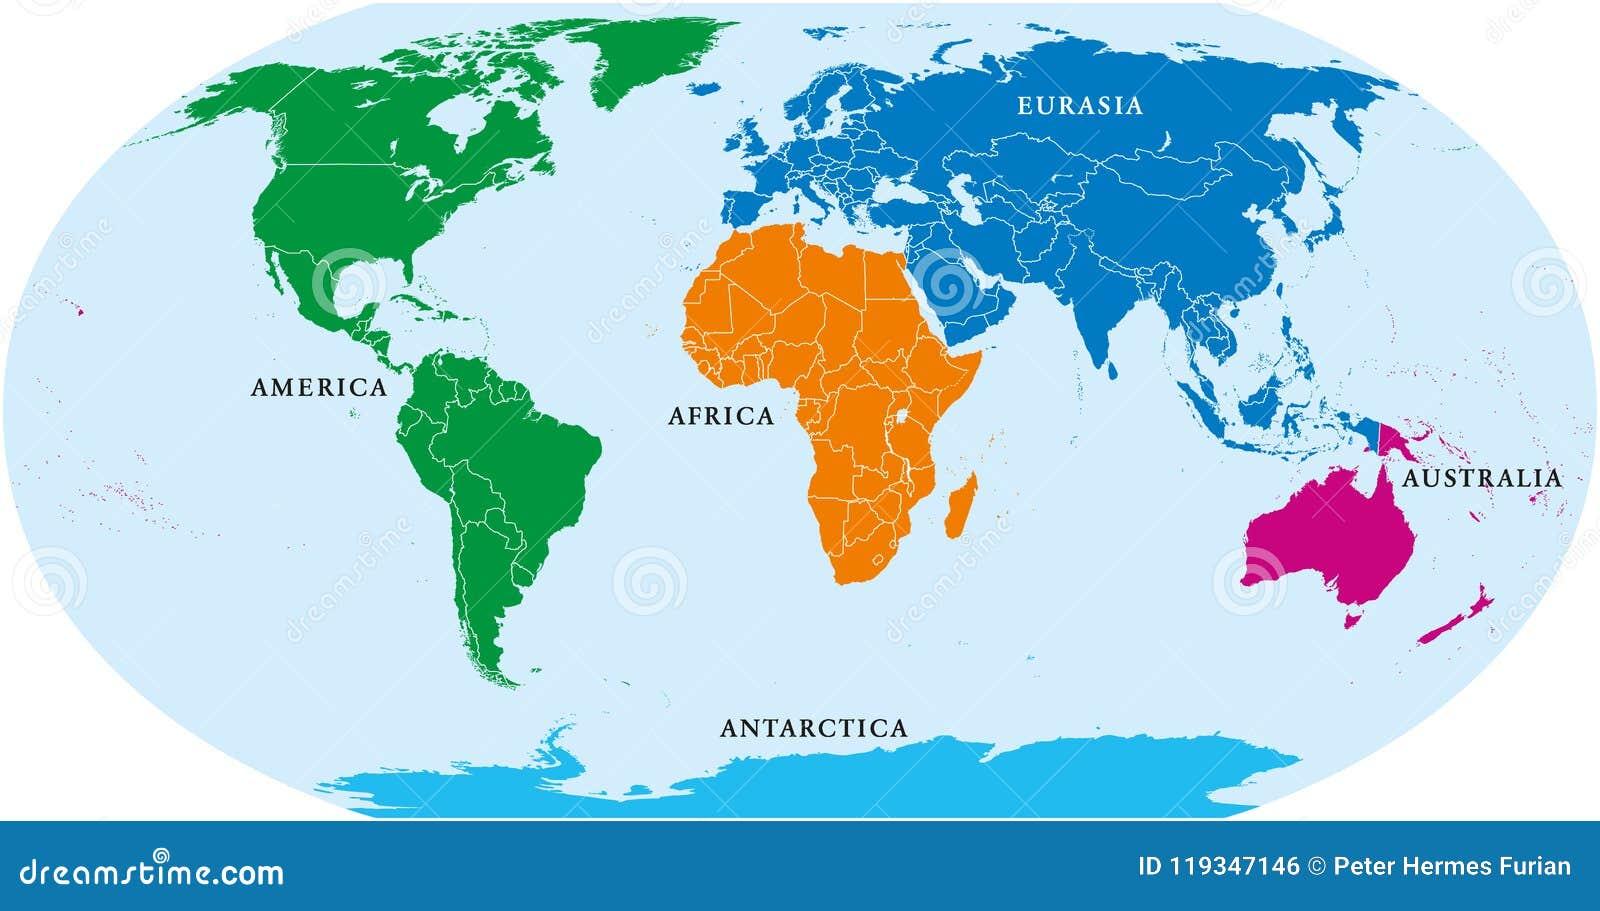 Mundo de cinco continentes, mapa político